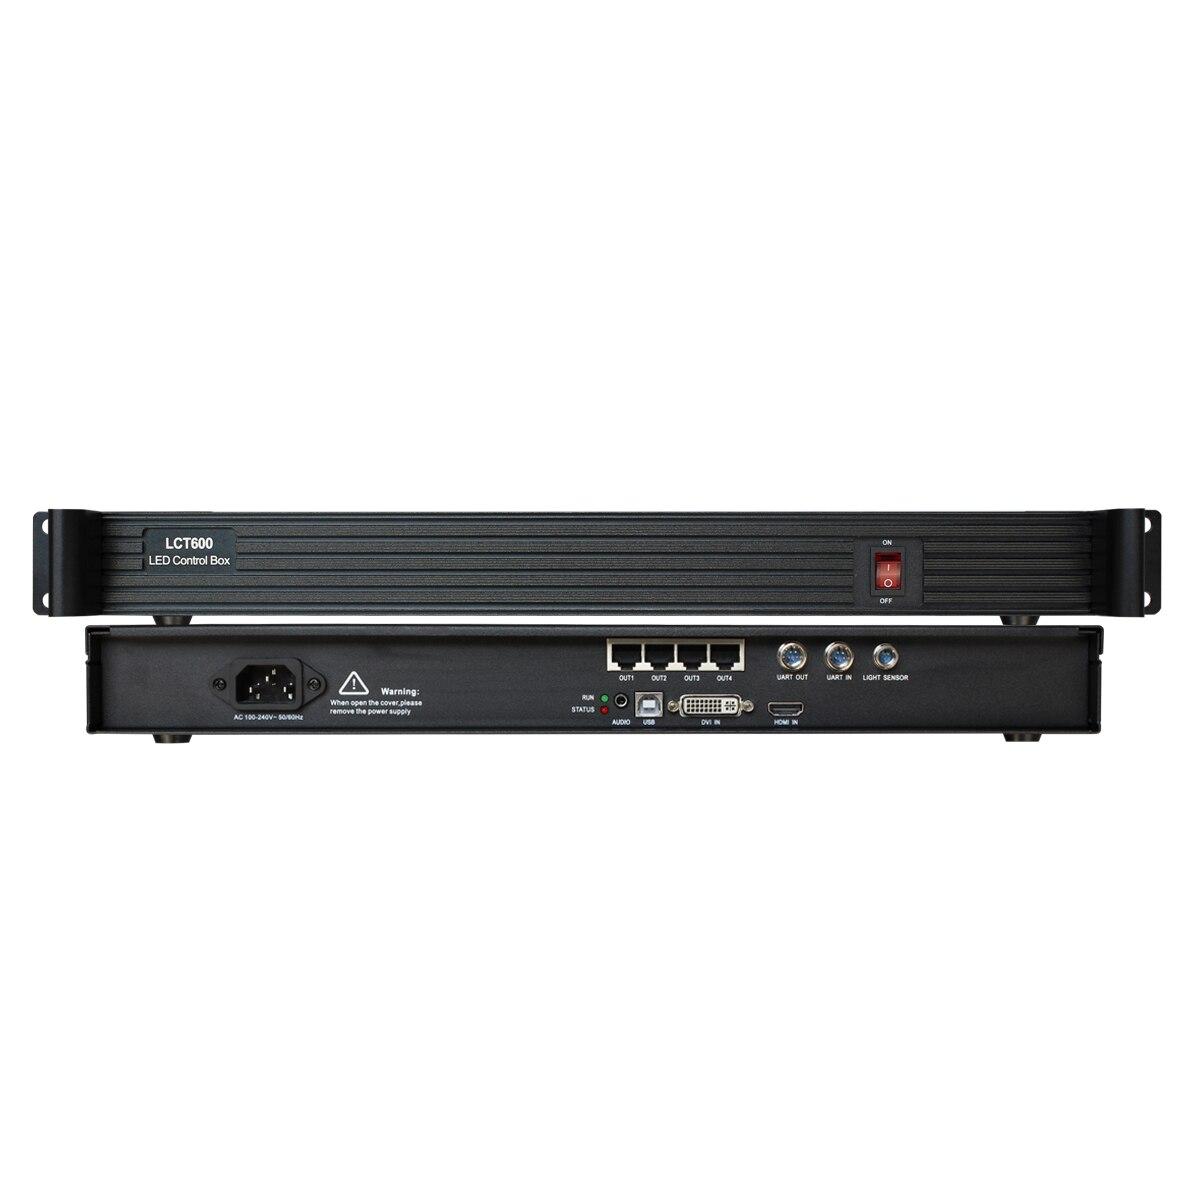 P2 P3 P4 P3.91 P2.5 P6 P5 P10 P16 64*64 128*64 LED Display Module Sending Card Box LCT600 With nova msd600 as Novastar Mctrl600